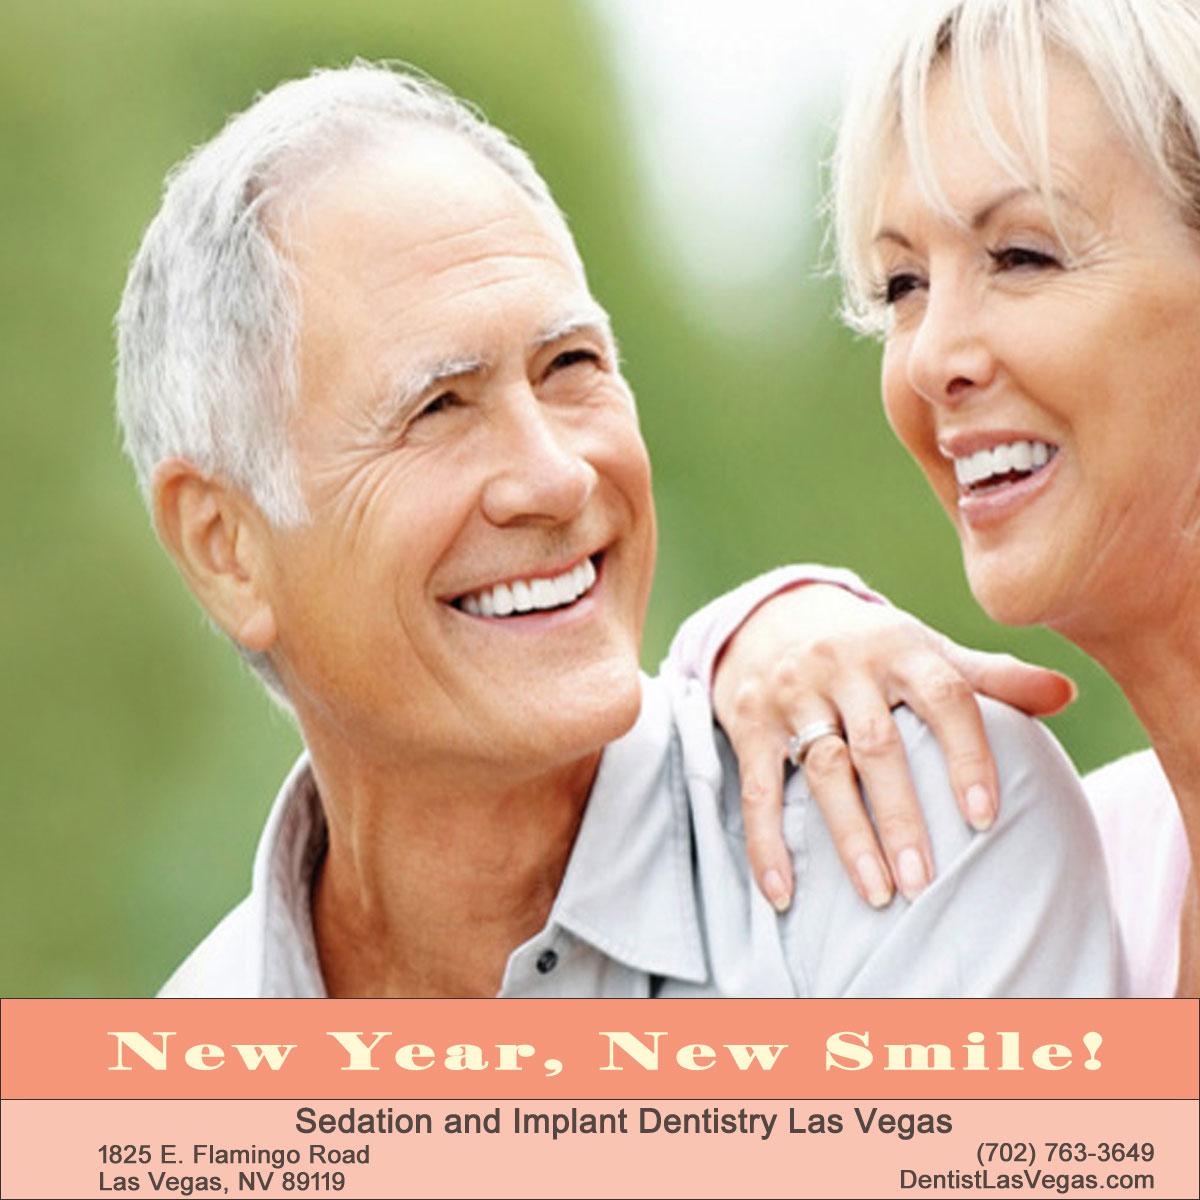 New-Year-New-Smile-1200xx-1.jpg?fit=1200%2C1200&ssl=1